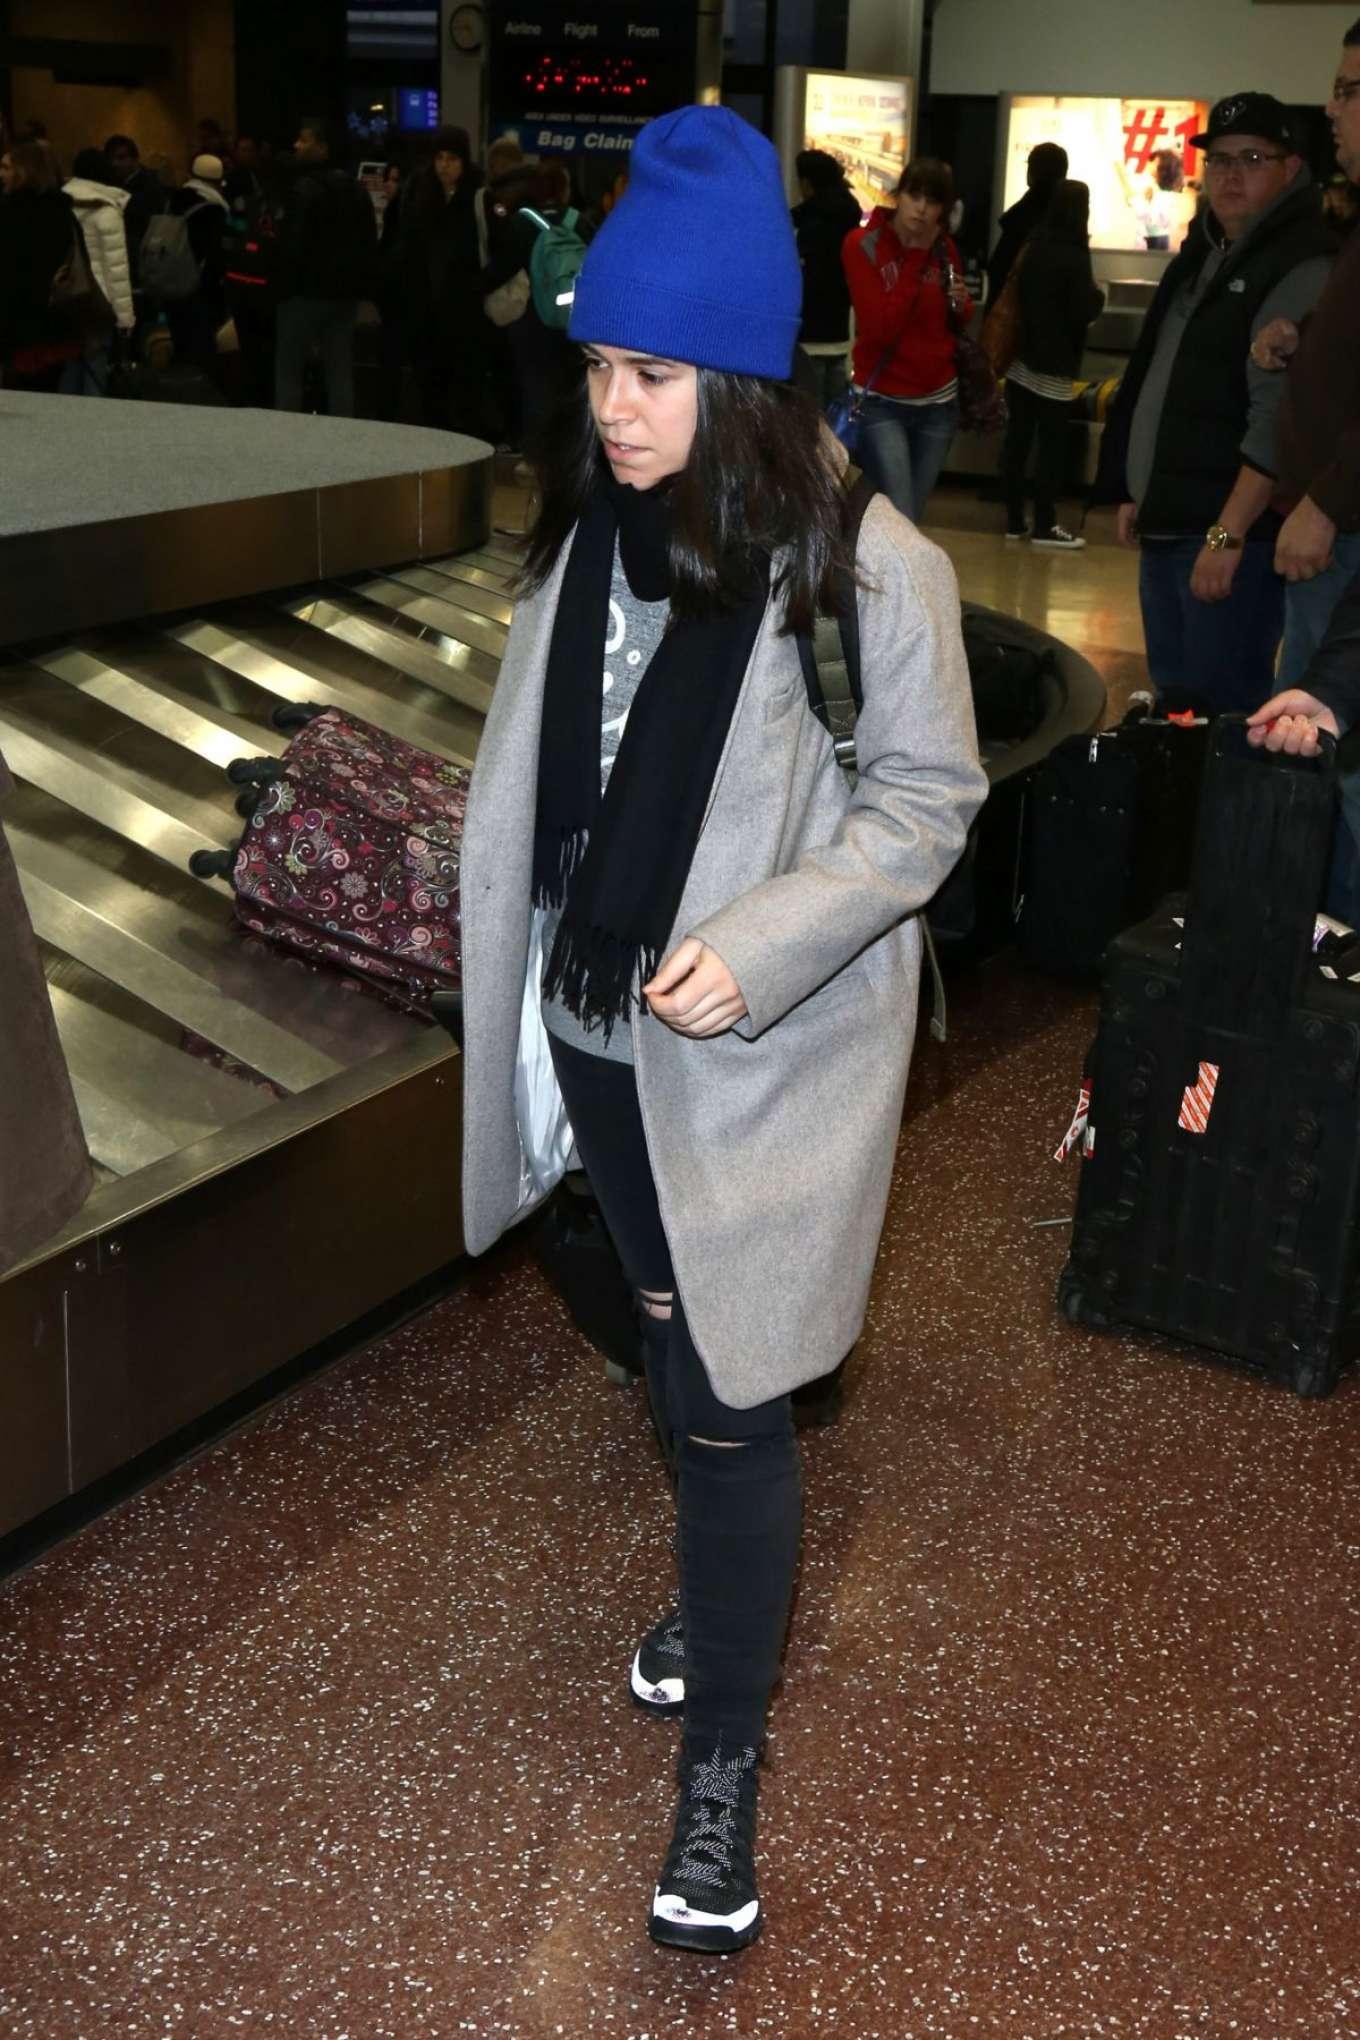 Abbi Jacobson - Arriving at Salt Lake City Airport